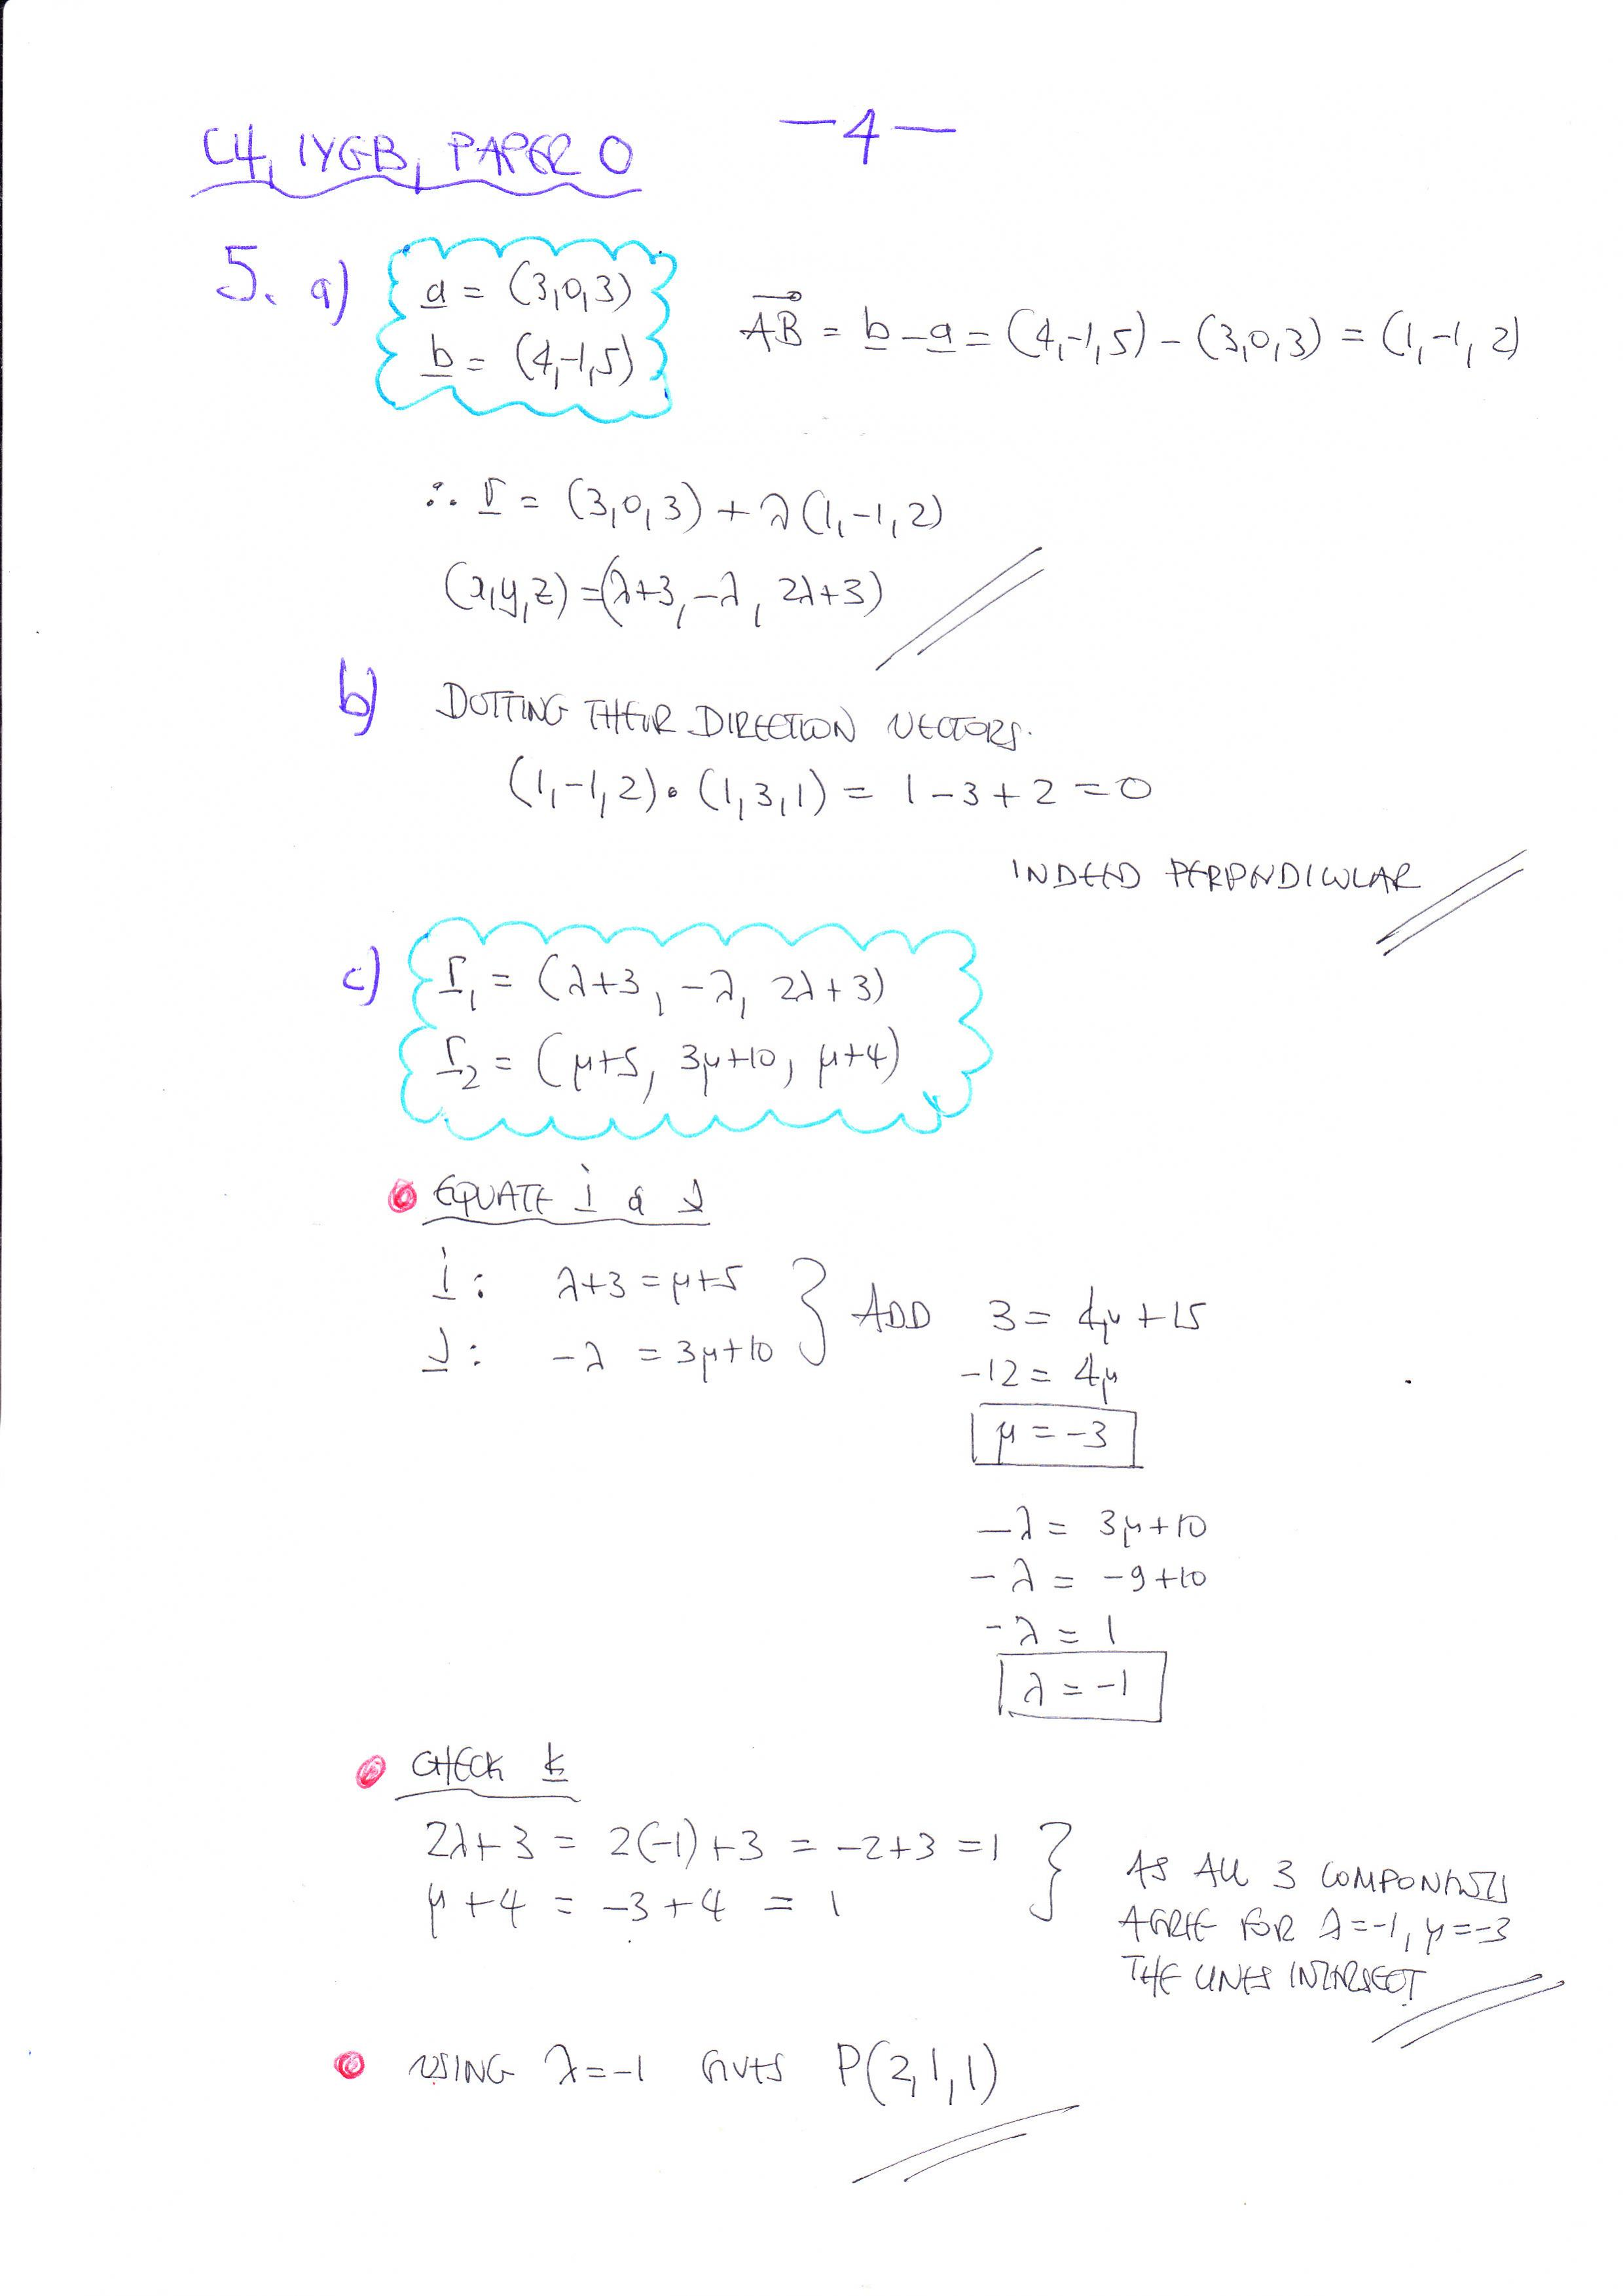 Name:  C4, IYGB, Paper O, page 4.jpg Views: 93 Size:  317.2 KB